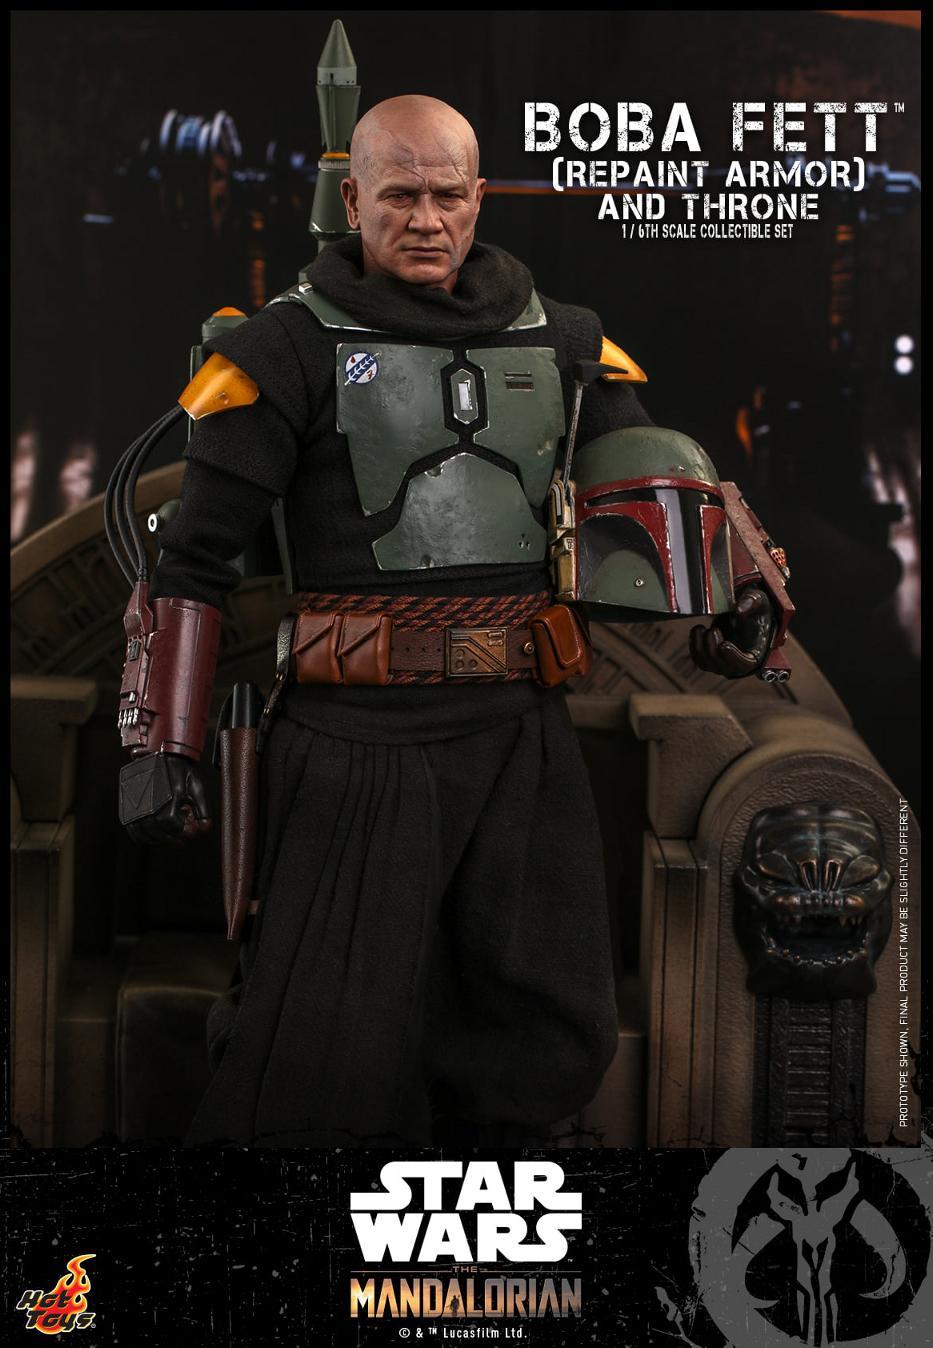 Boba Fett (Repaint Armor) & Throne Collectible Set Hot Toys Boba_f47